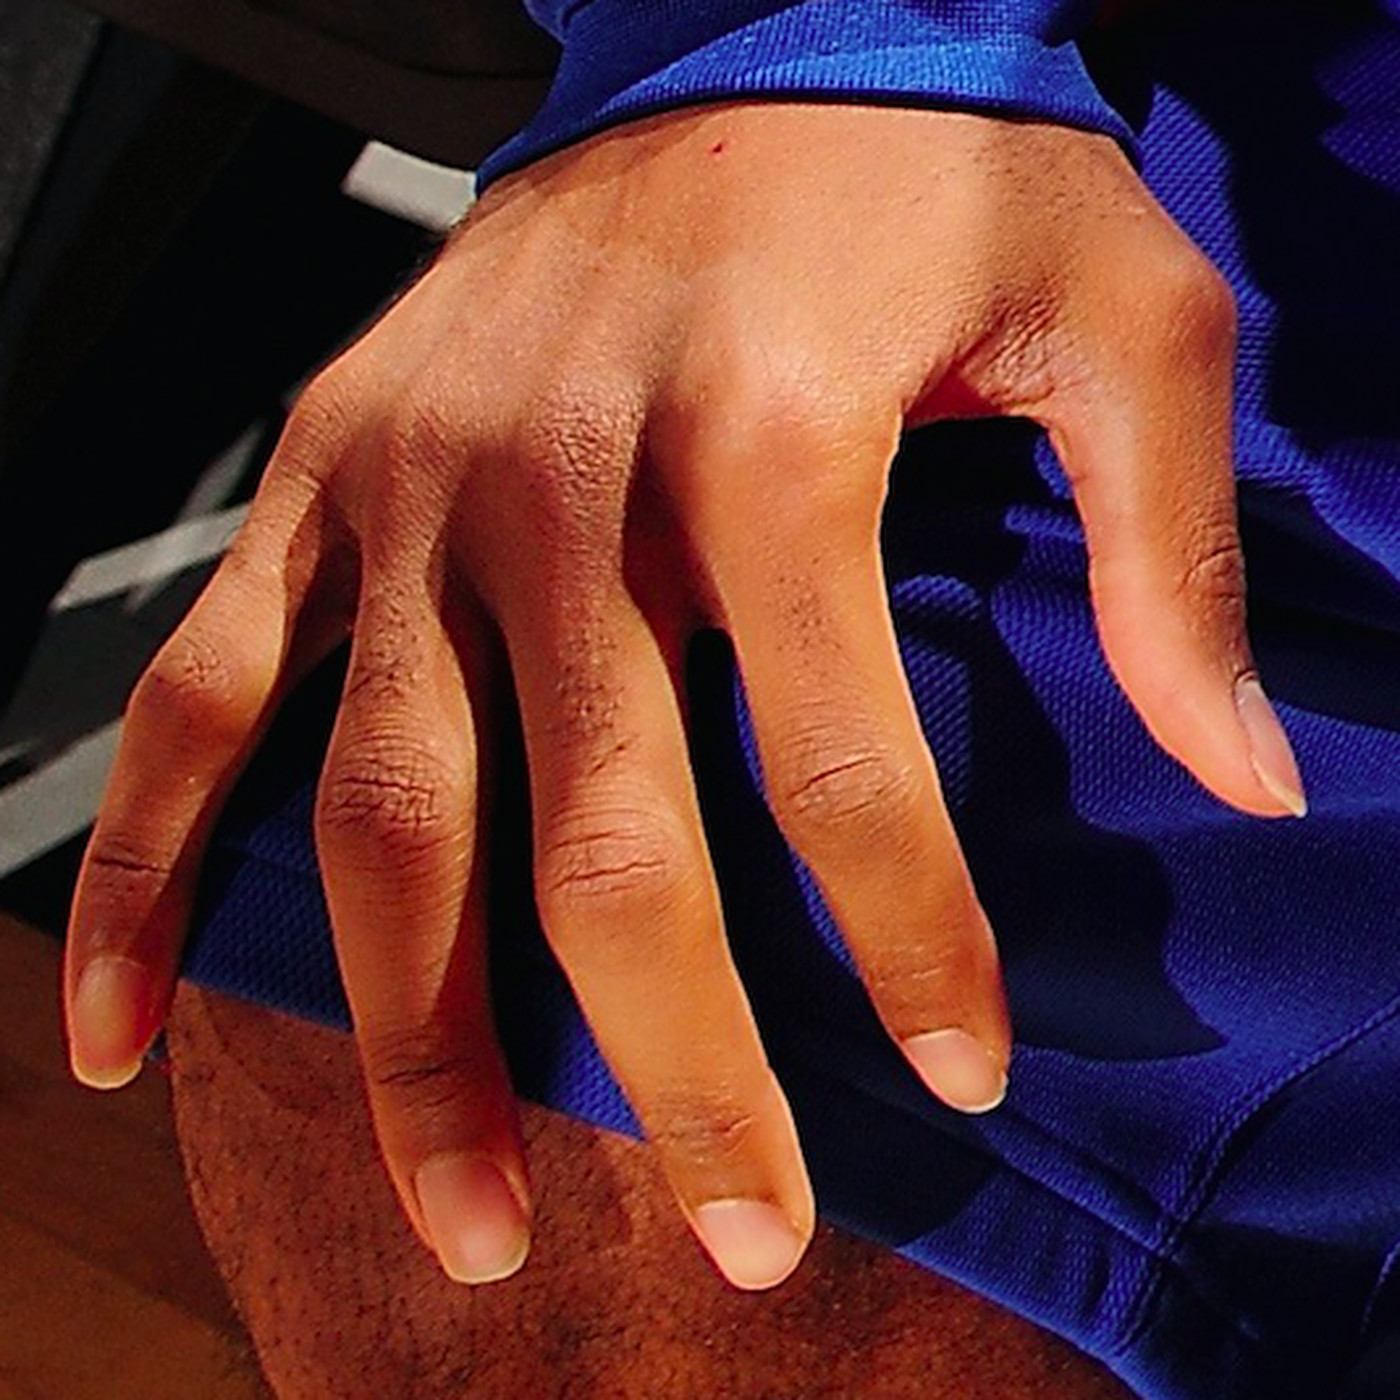 Dear basketball players, please cut your fingernails - SBNation.com